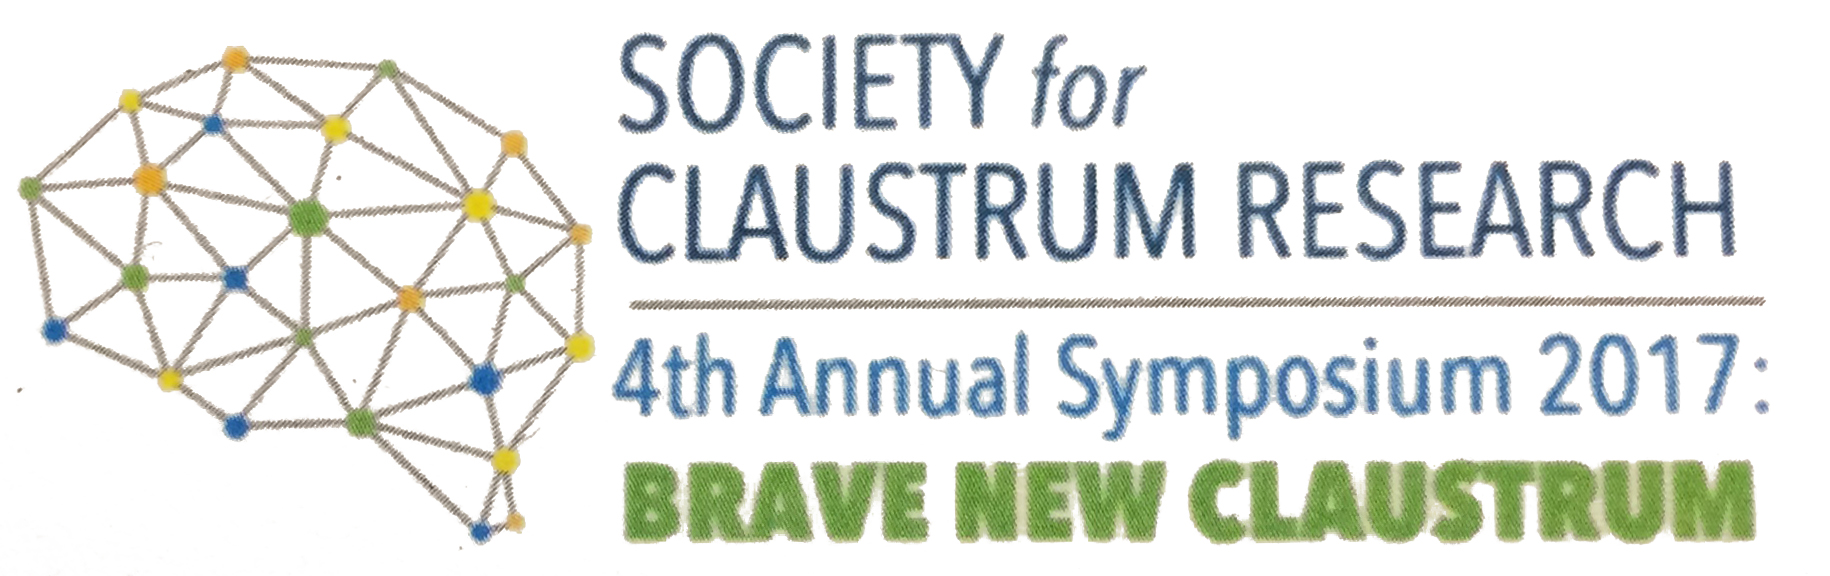 claustrum society meeting 2017.jpg